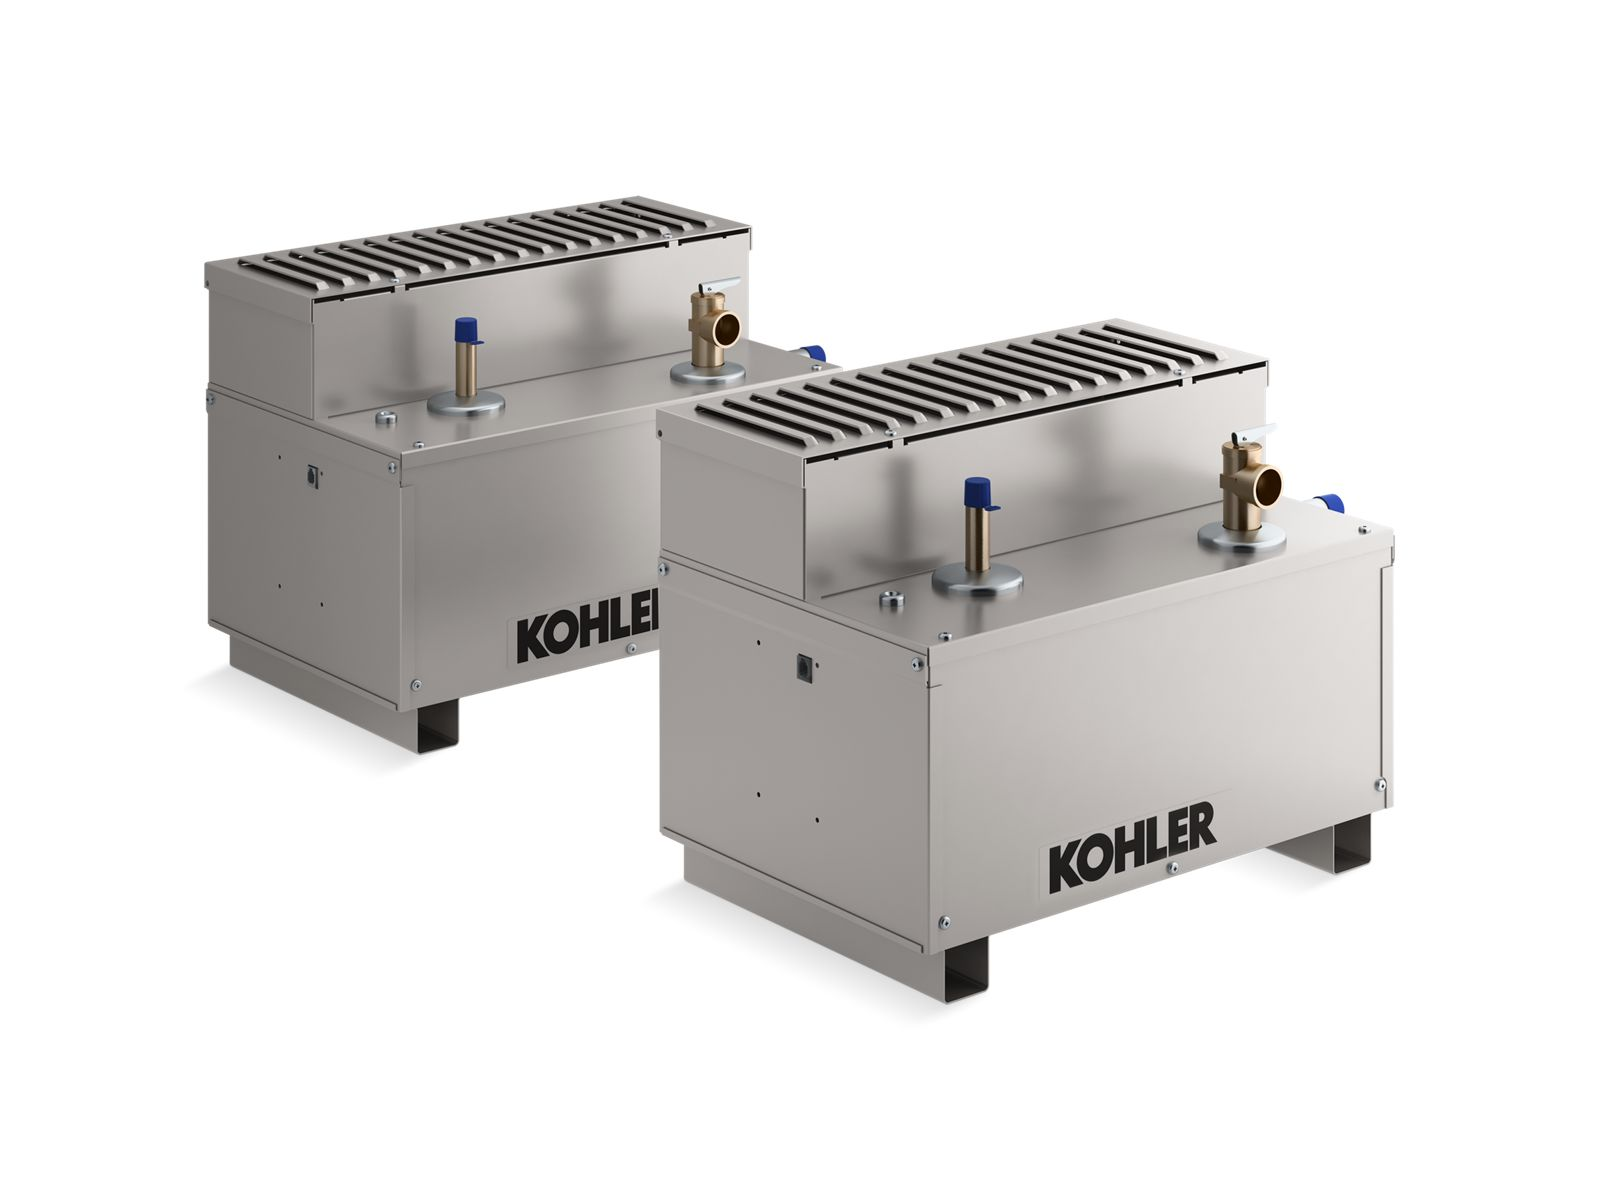 kohler 20kw generator wiring diagram 6 lead placement for telemetry transfer